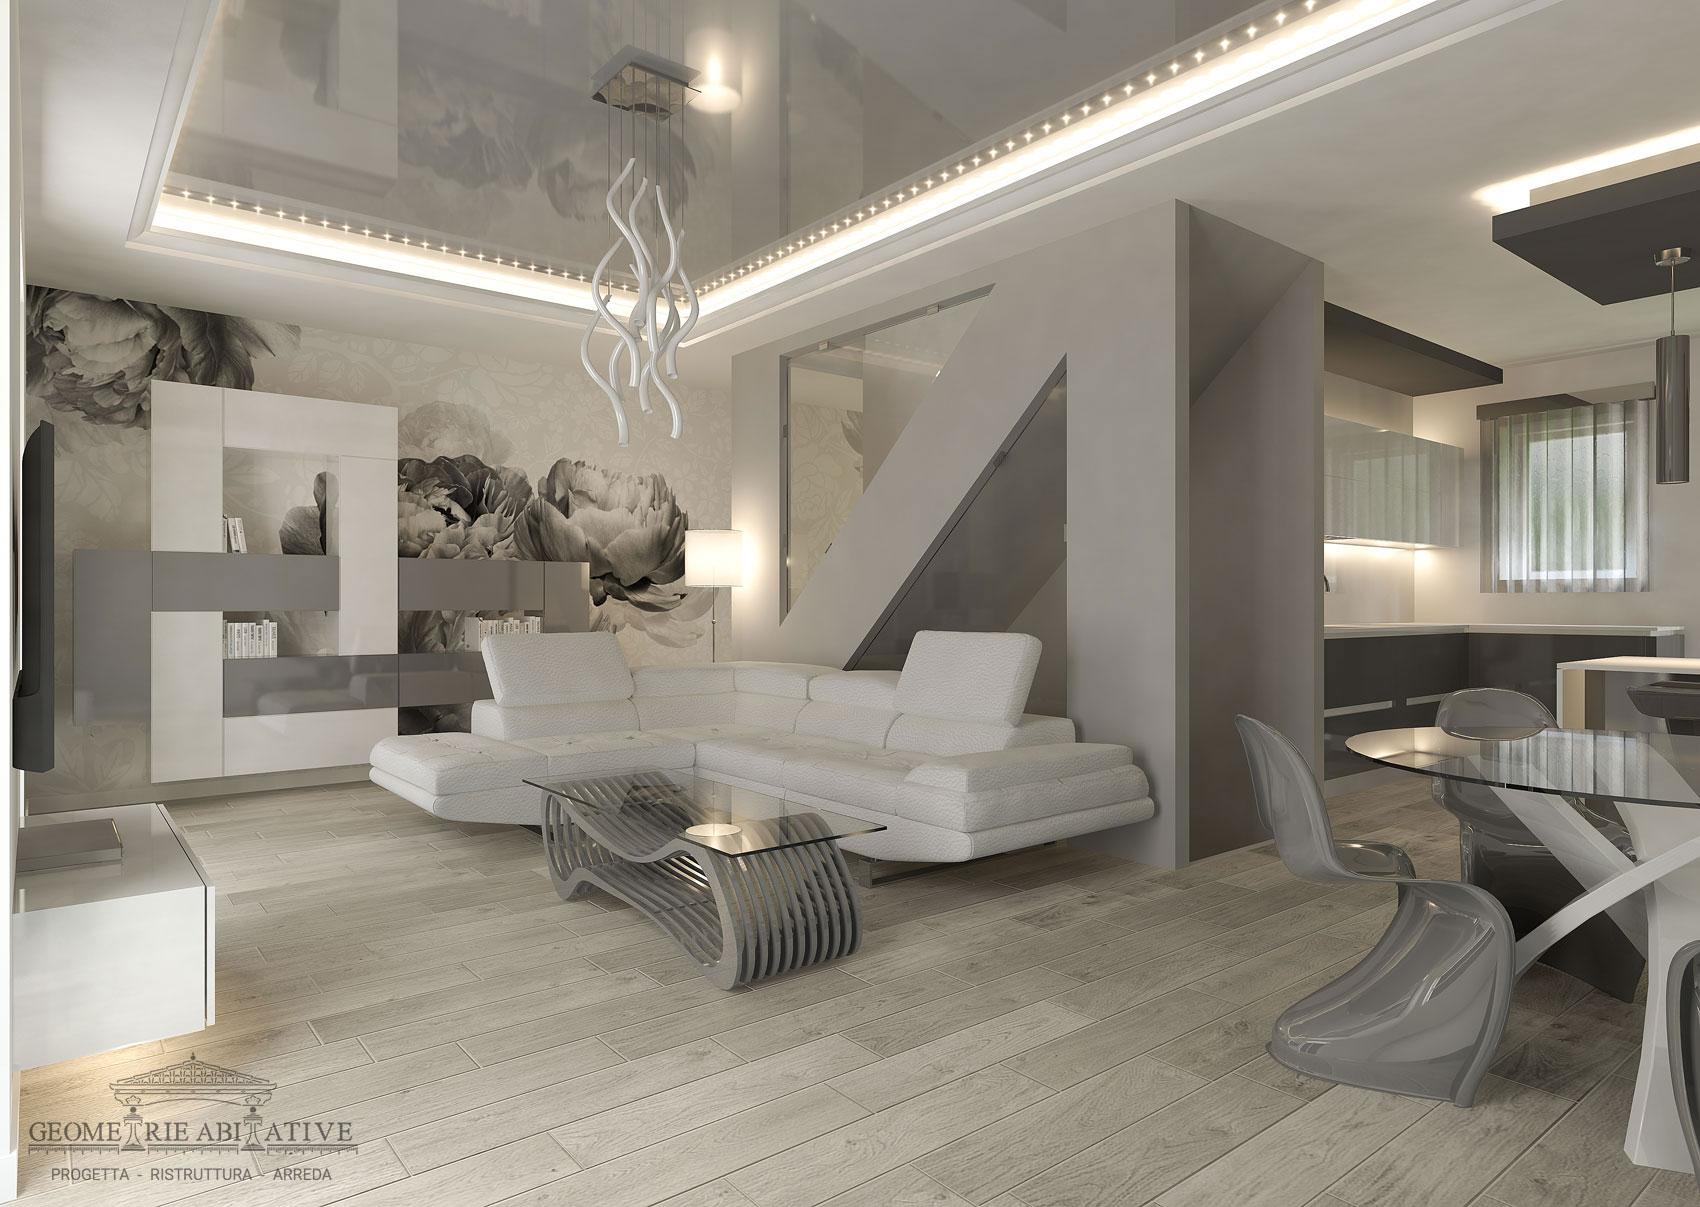 Casa con arredamento moderno geometrie abitative for Arredo ingresso design